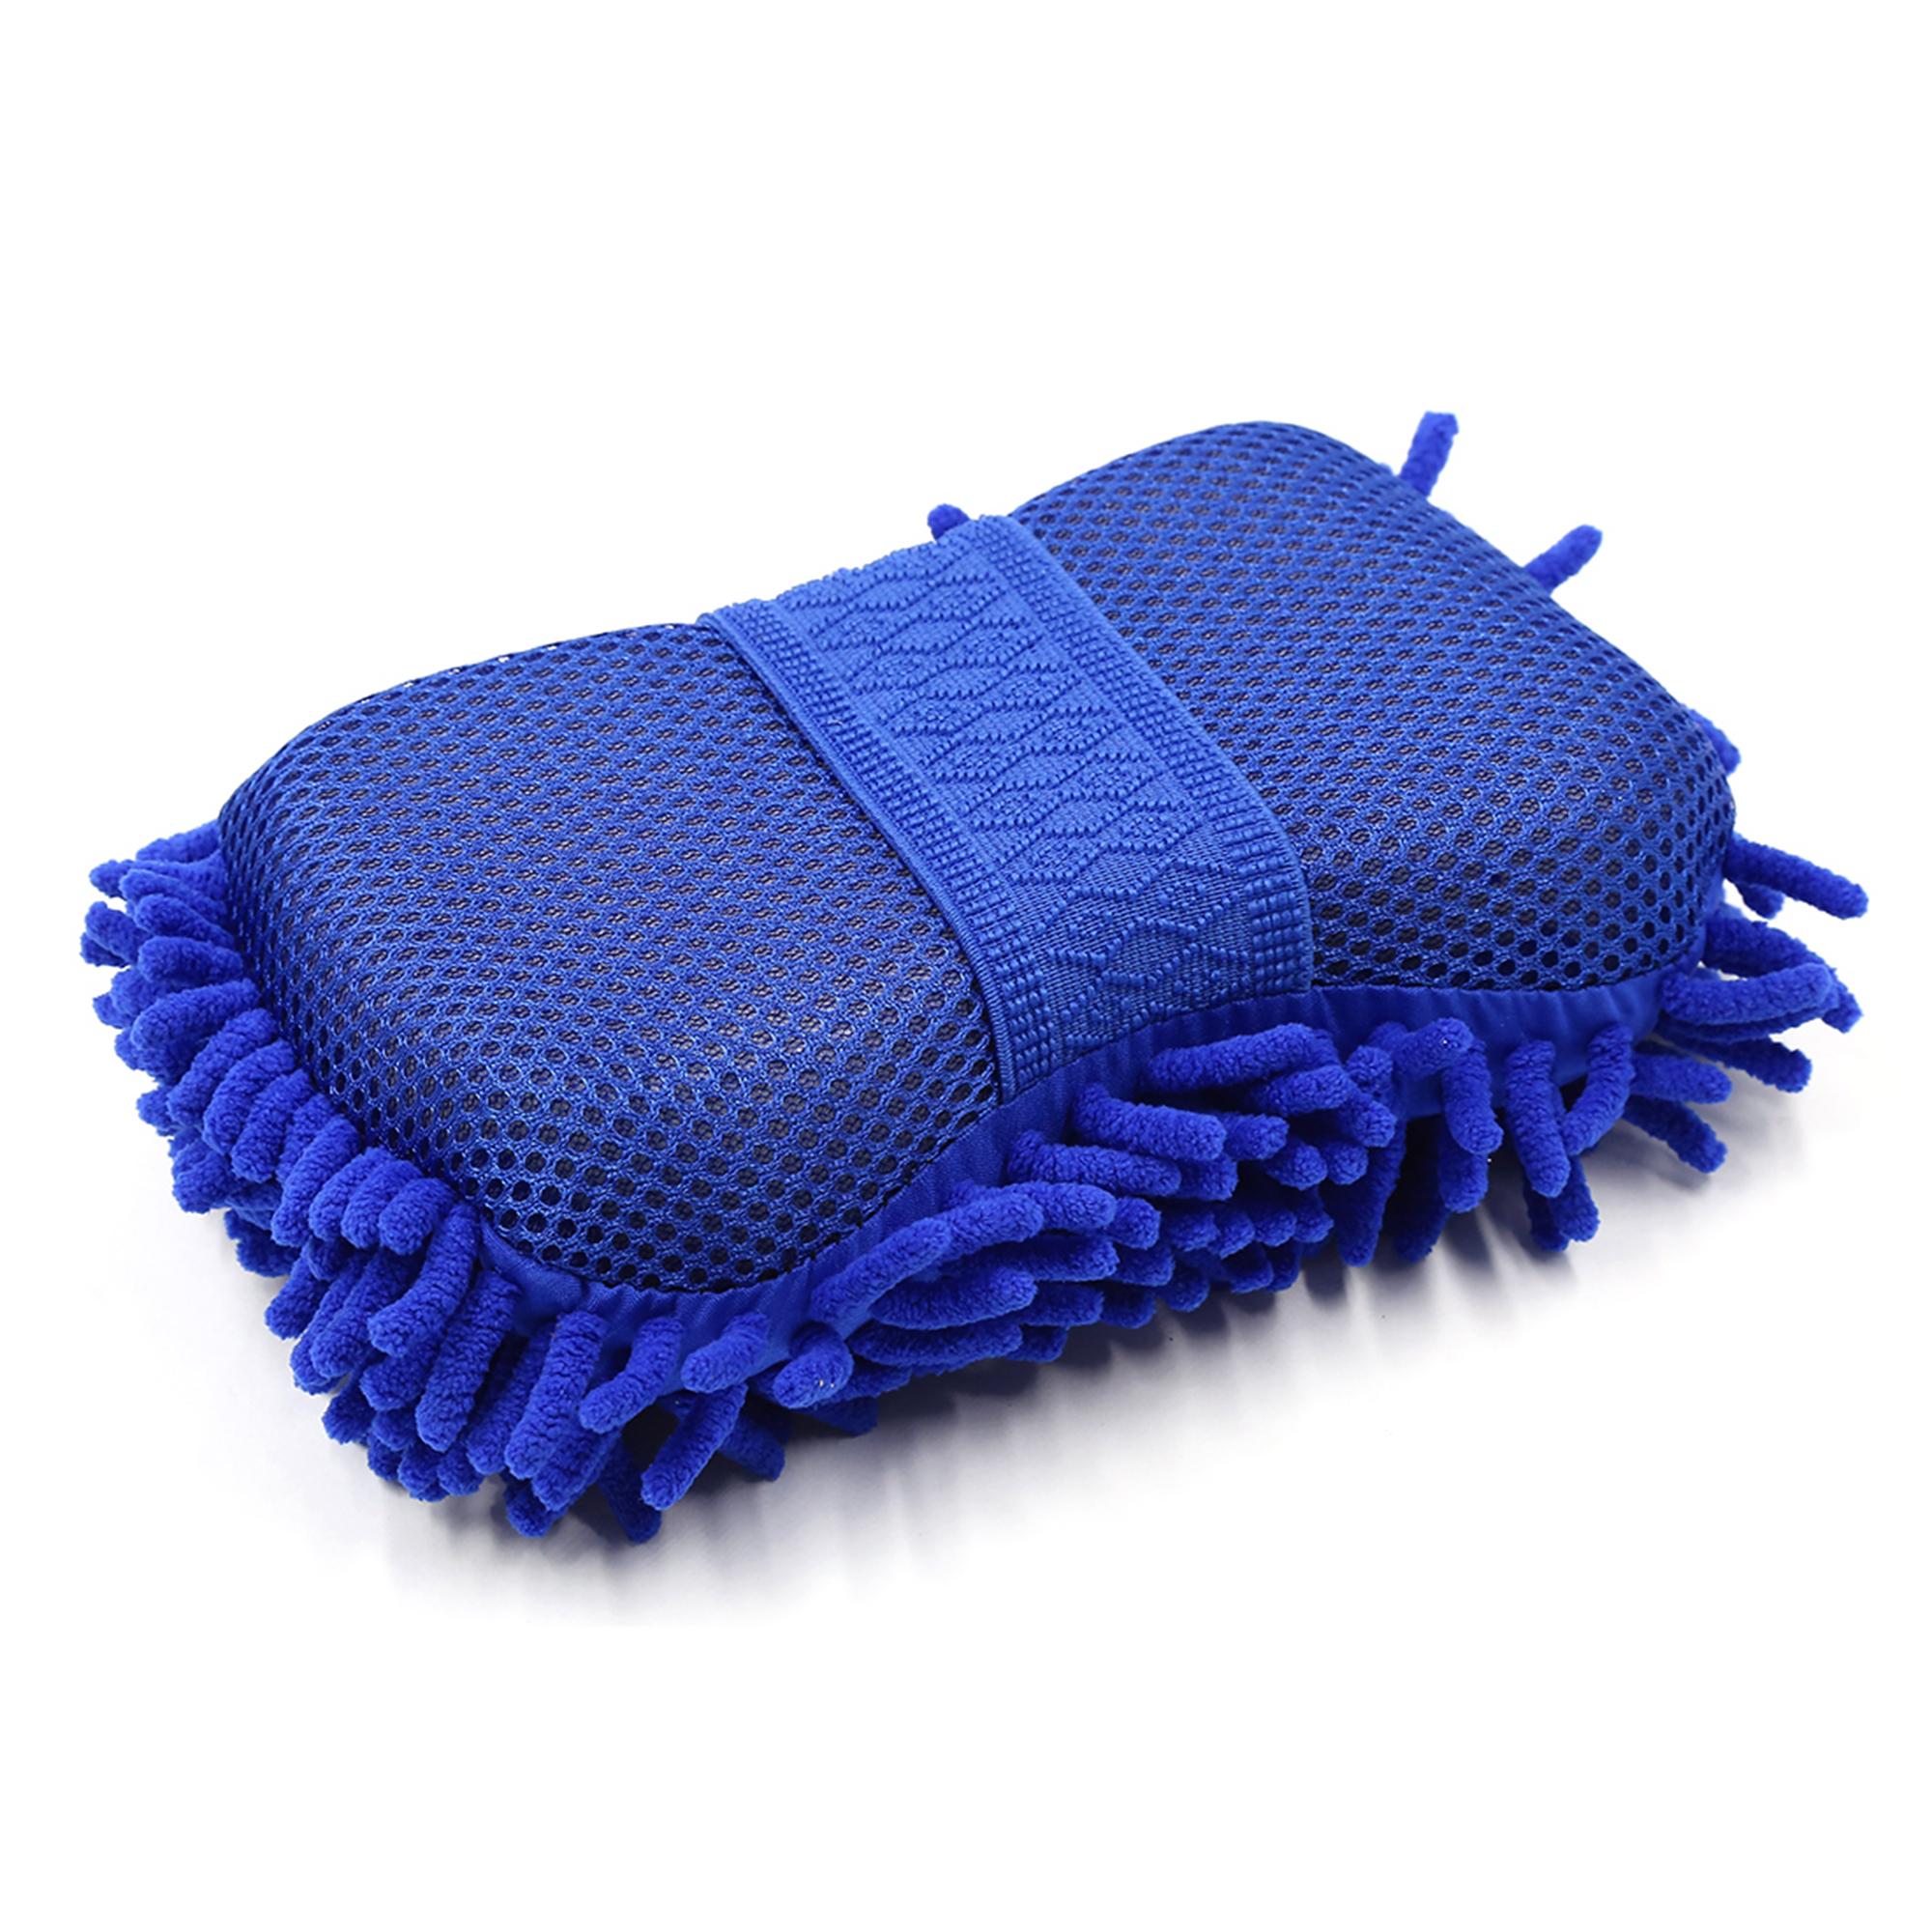 Blue Elastic Microfiber Chenille Wash Brush Sponge Pad Cleaner Car Cleaning Tool